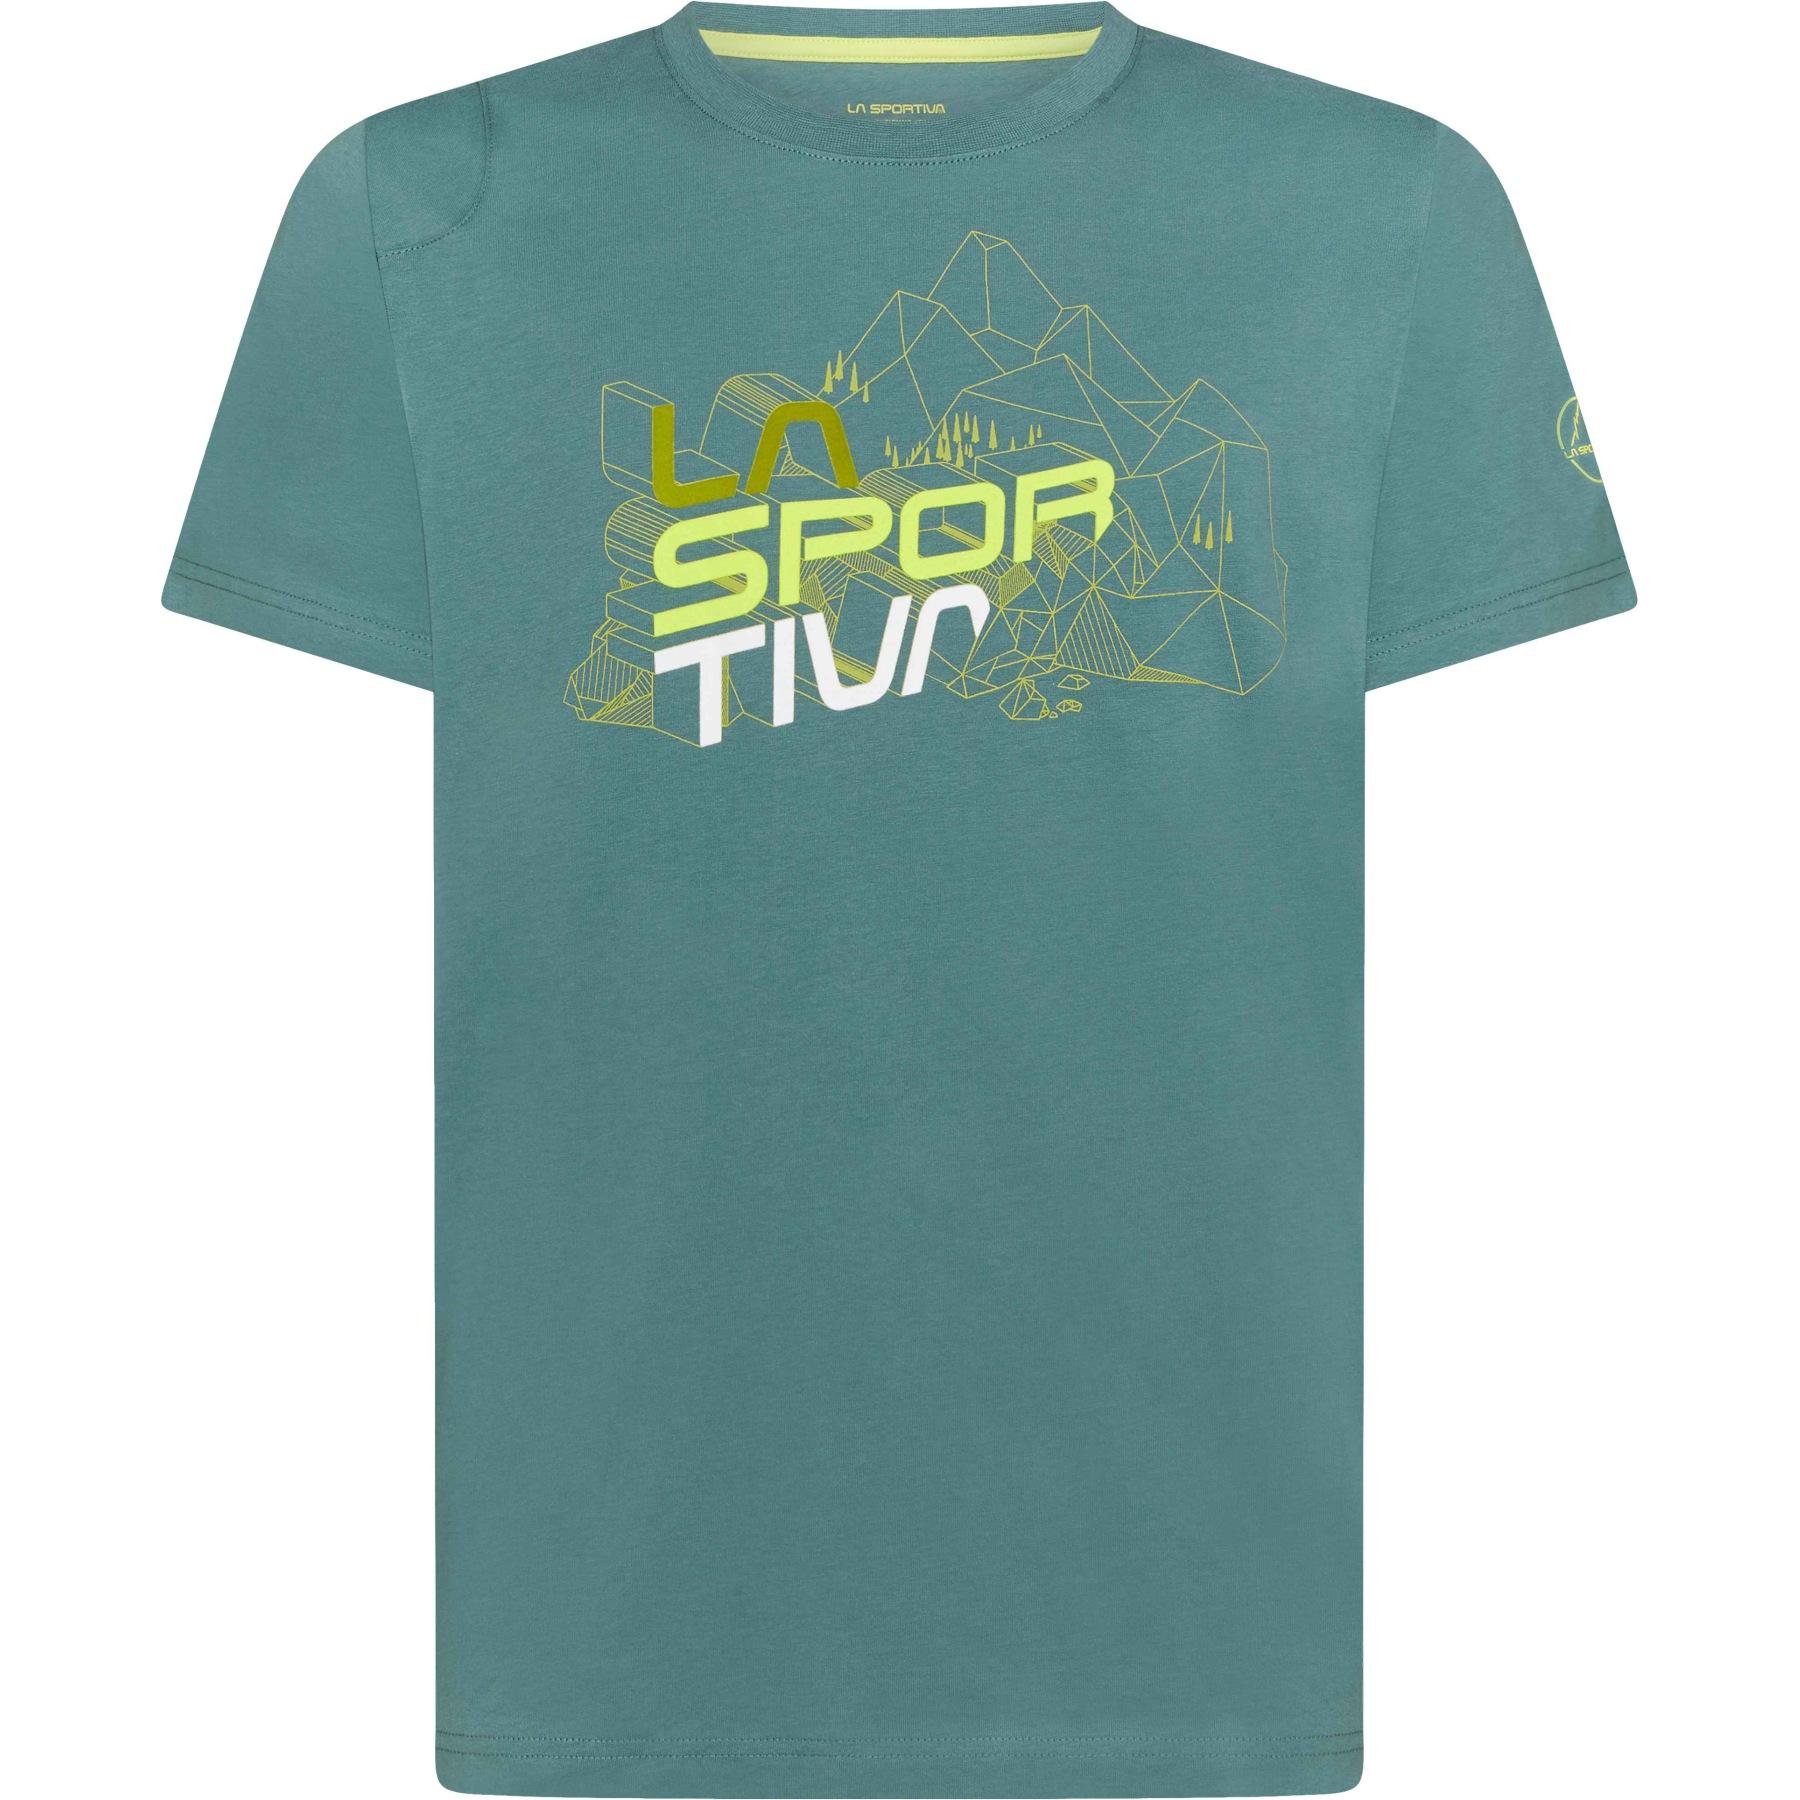 La Sportiva Cubic T-Shirt - Pine